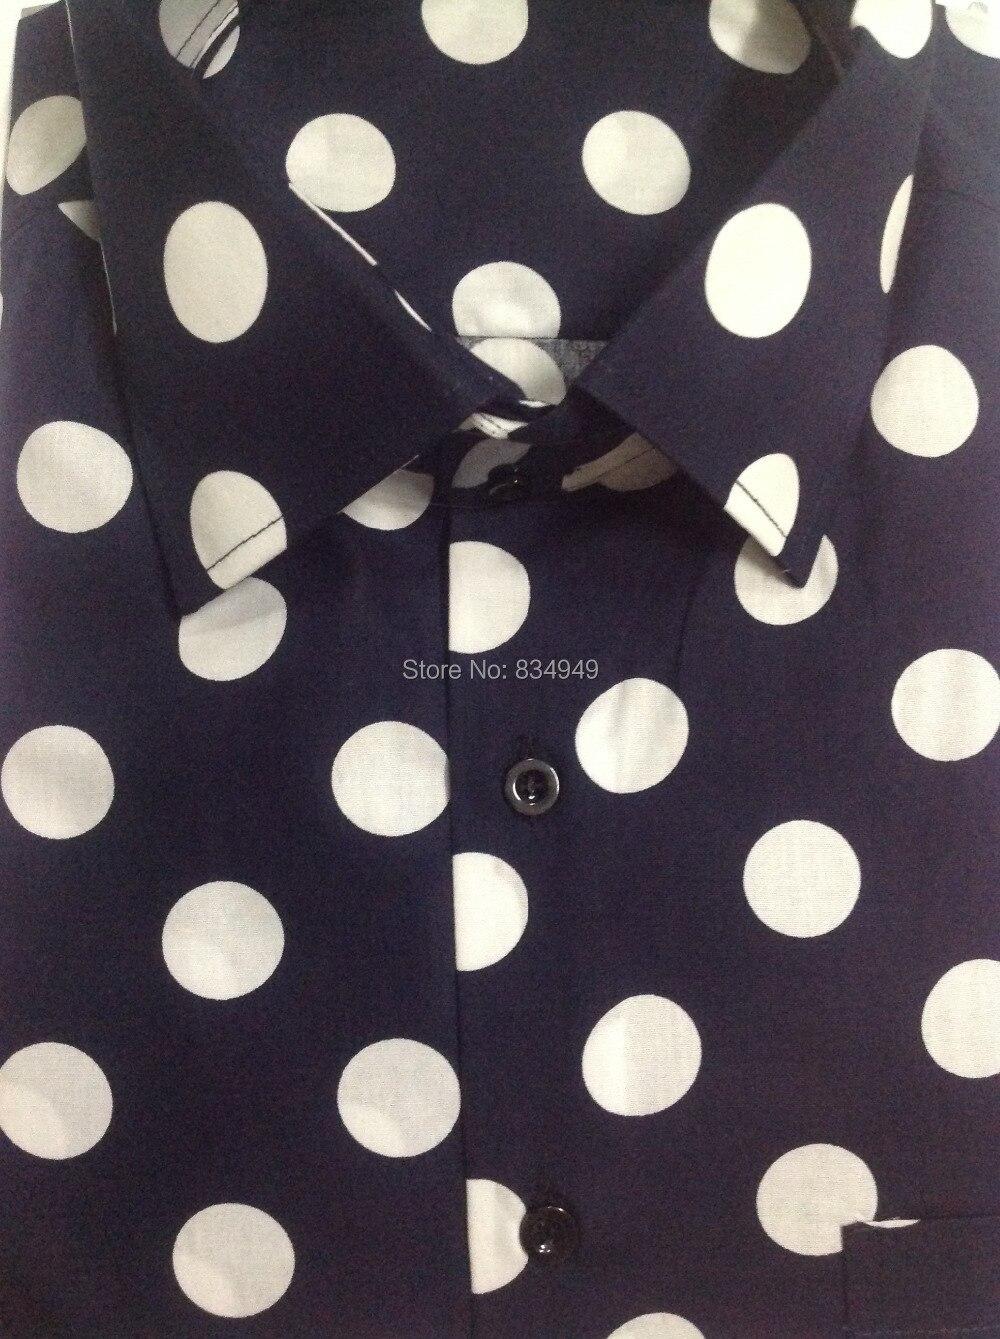 Men/'s 100/% Cotton Polka Dot Design Dress Shirt Black//White White//Navy Size 15~20